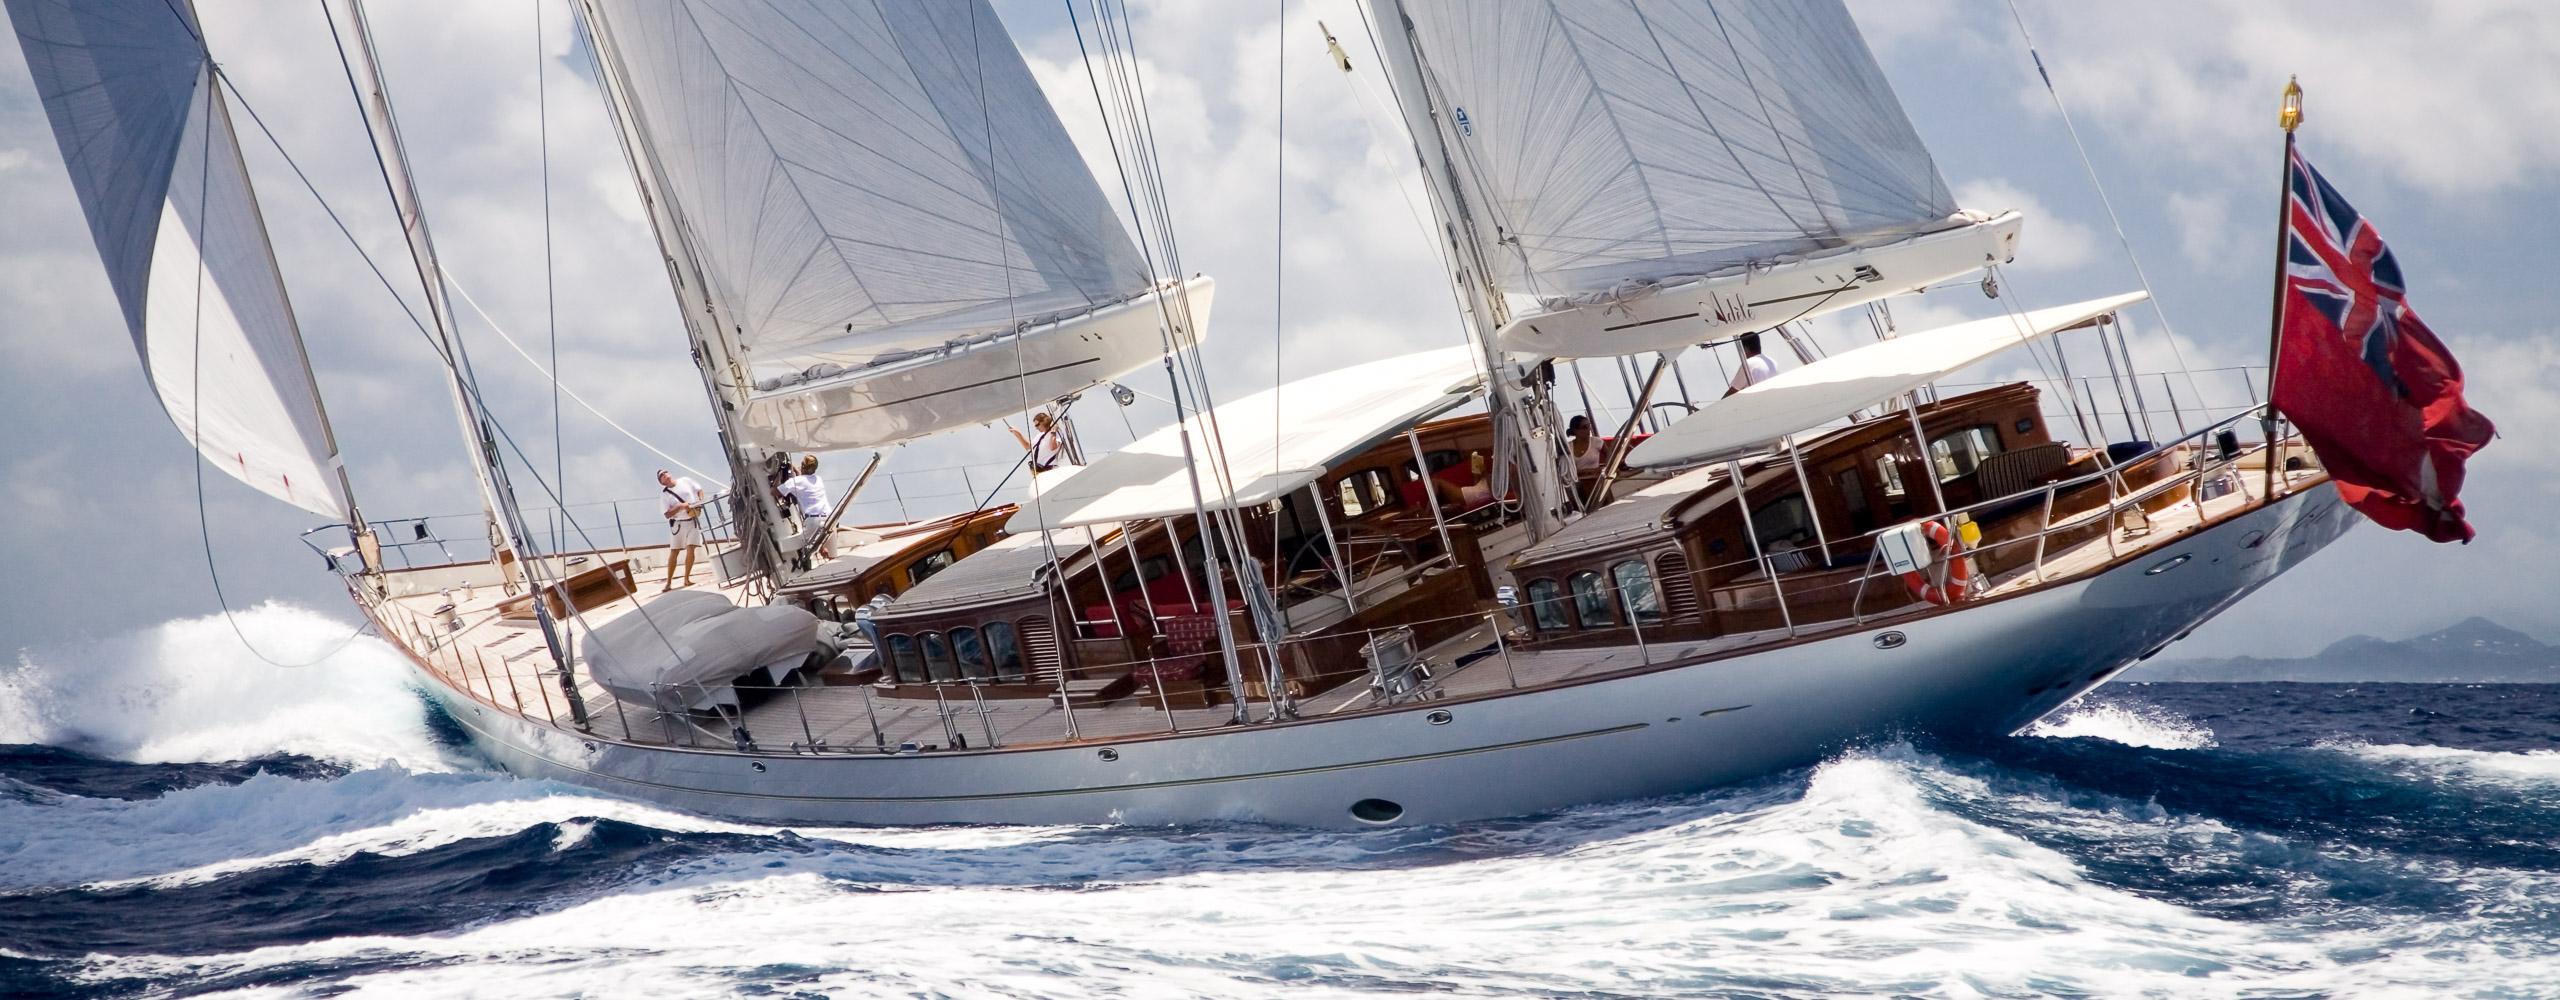 Adèle under sail